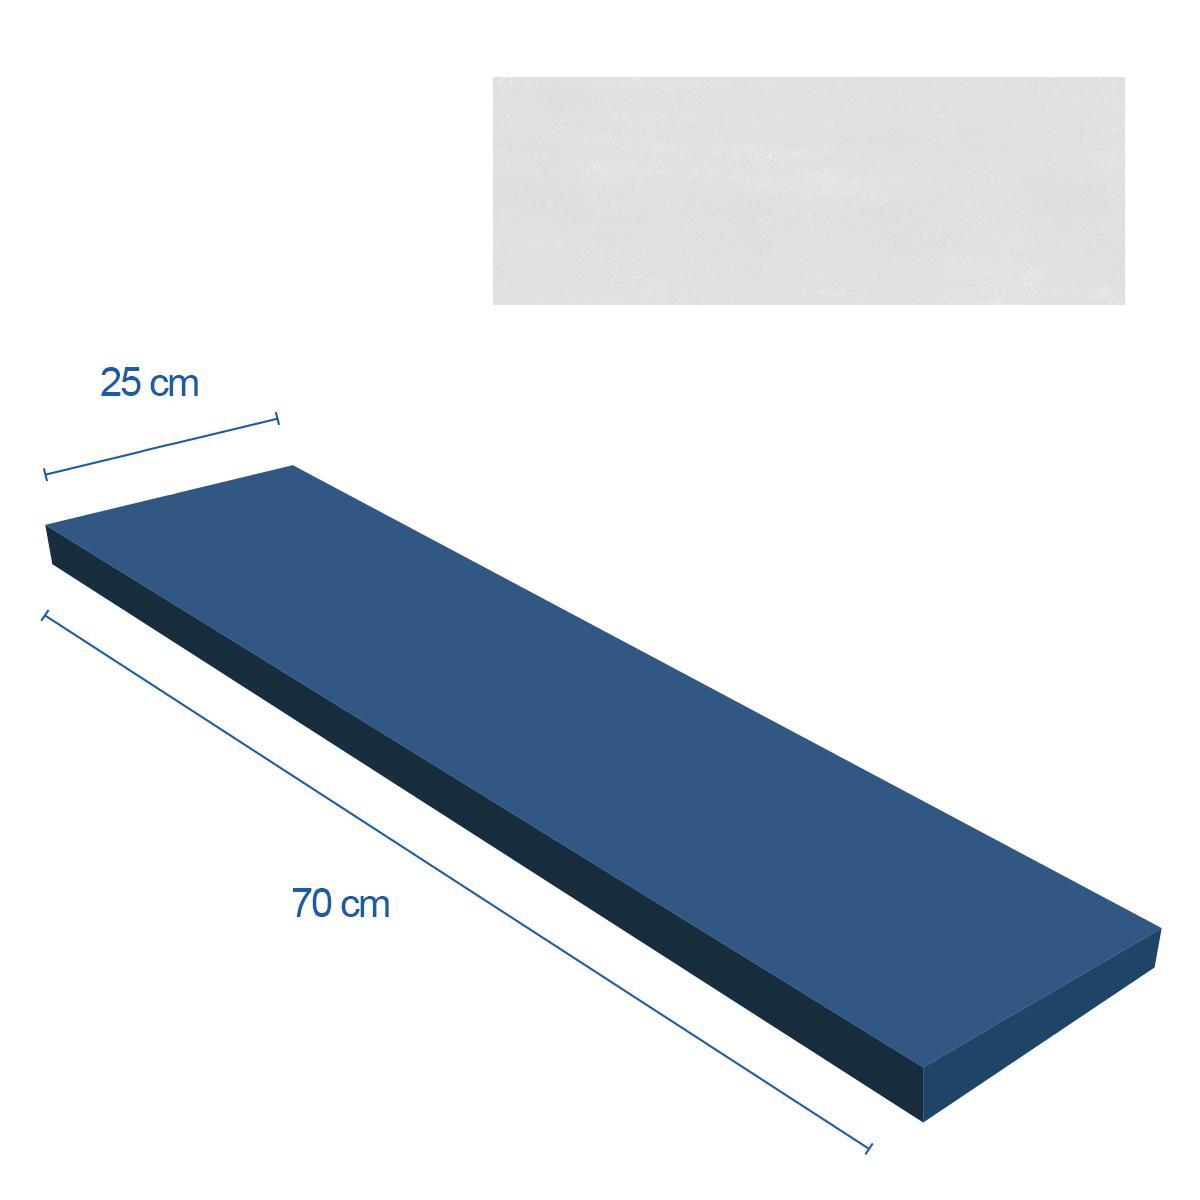 Mayólica Malden Gris Mate - 25X70 cm - 1.58 m2